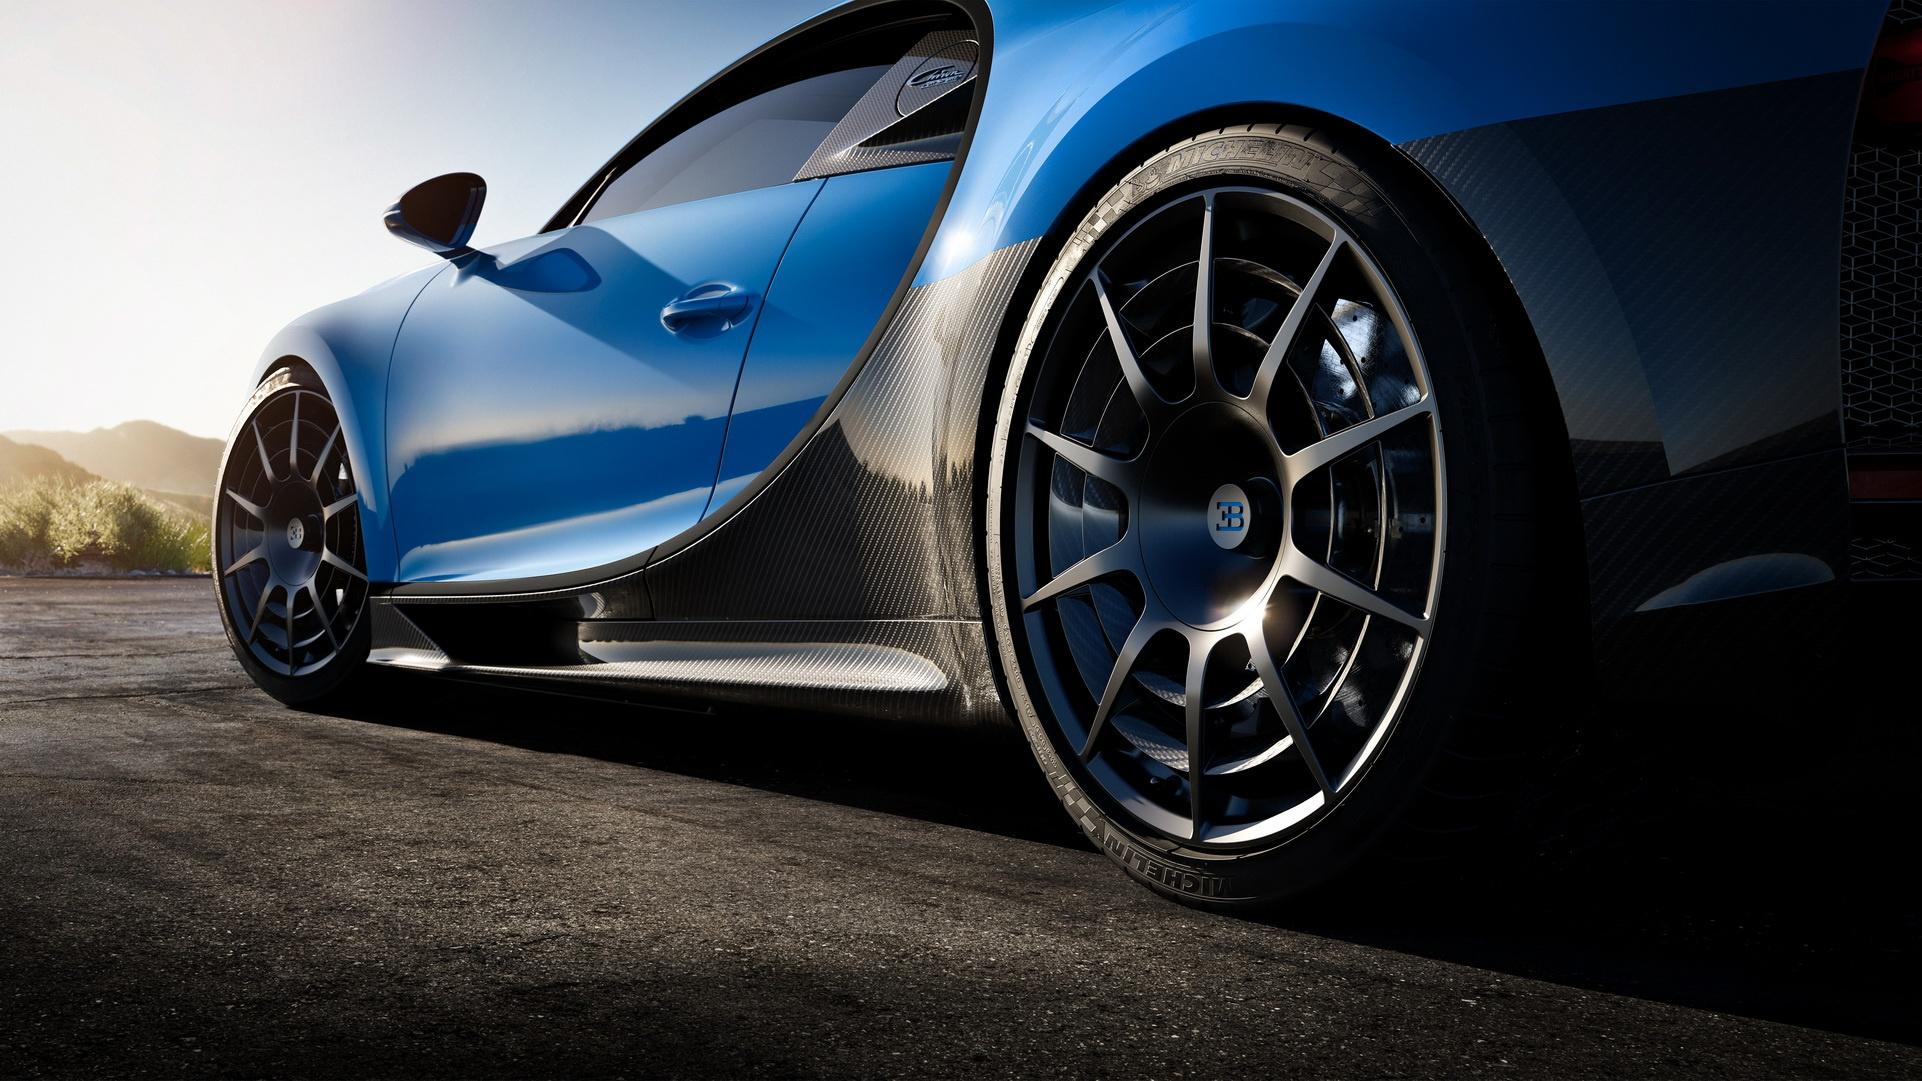 Bugatti Chiron phien ban moi ra mat - sieu xe gia 3,55 trieu USD hinh anh 12 B1.jpg